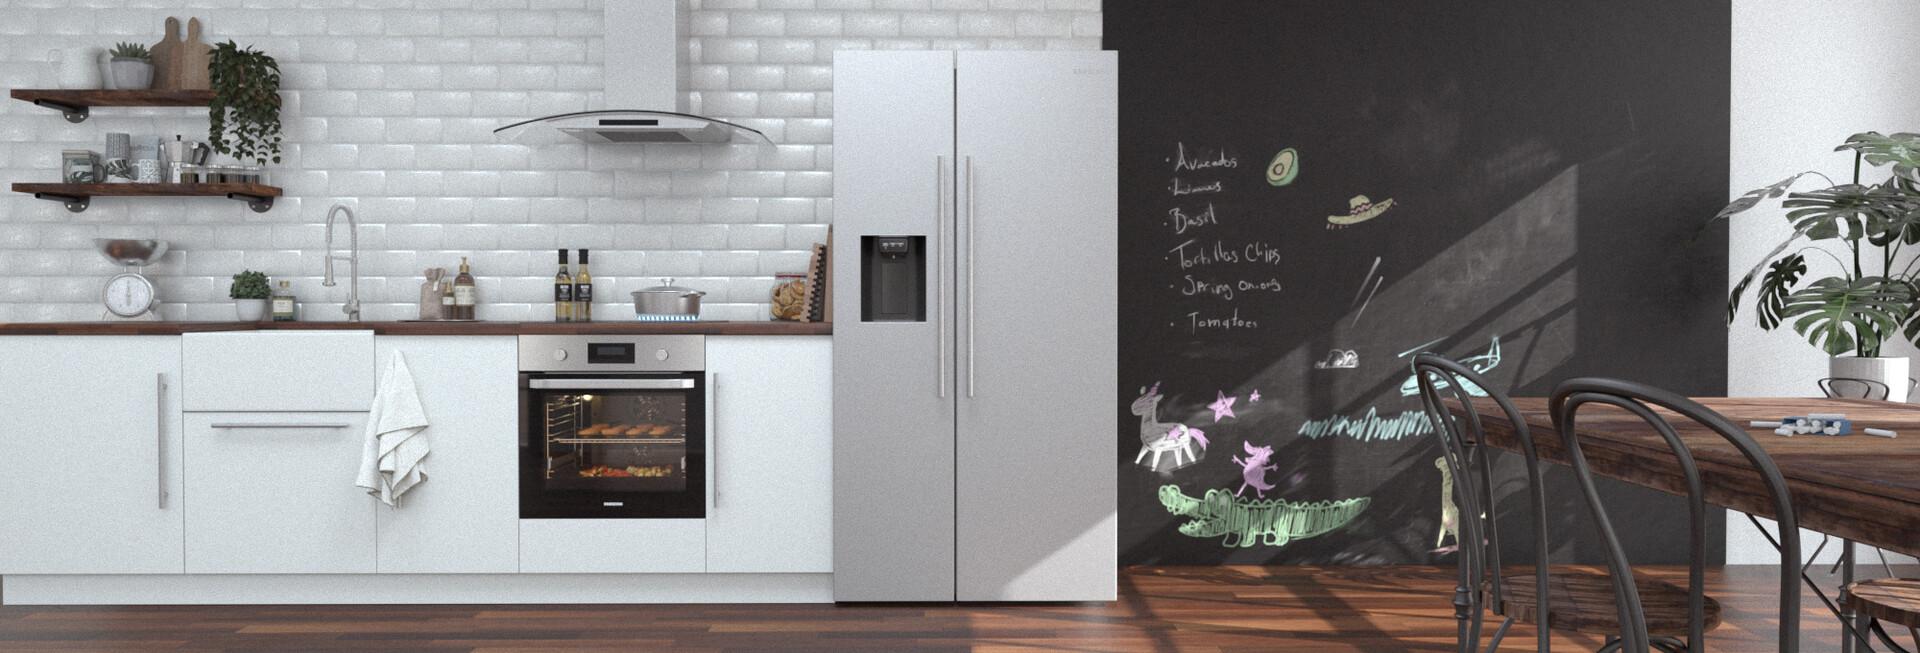 Emily Noble 3d Industrial Kitchen Design Banner